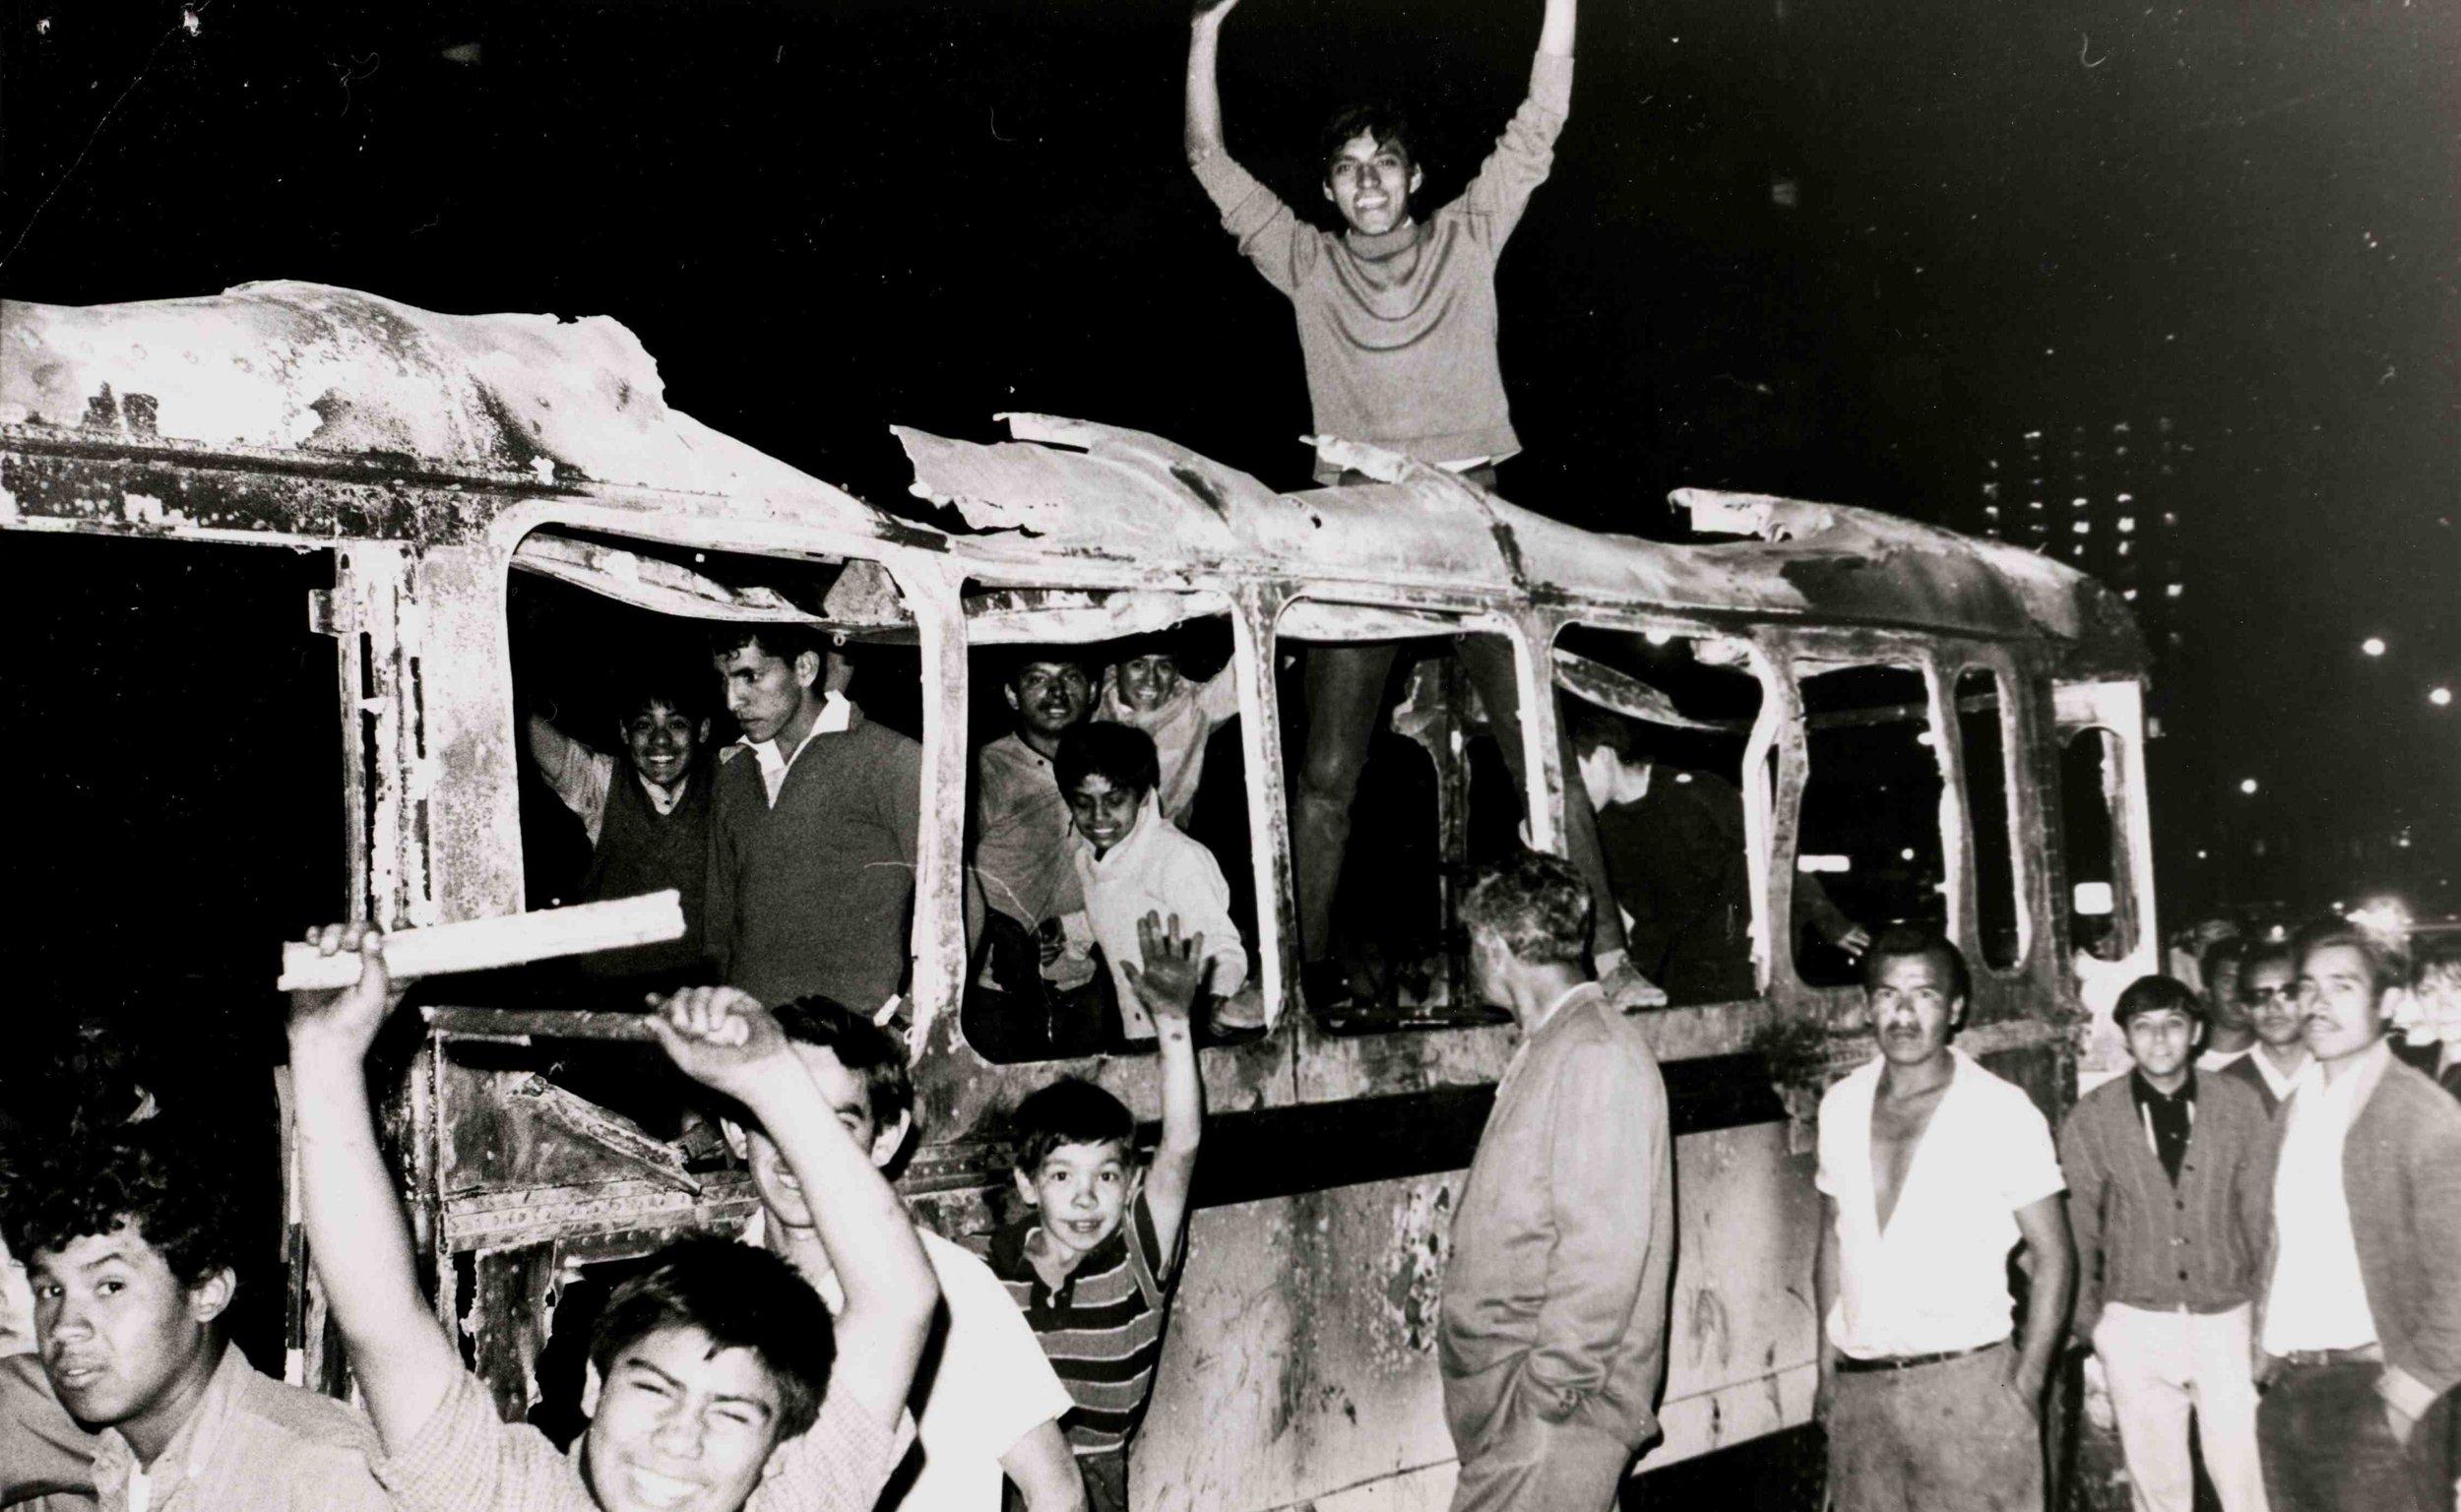 10,000 students gathered in Plaza de Las Tres Culturas during the '68 Tlatelolco Massacre, demanding ' No queremos olimpiadas, queremos revolución! '